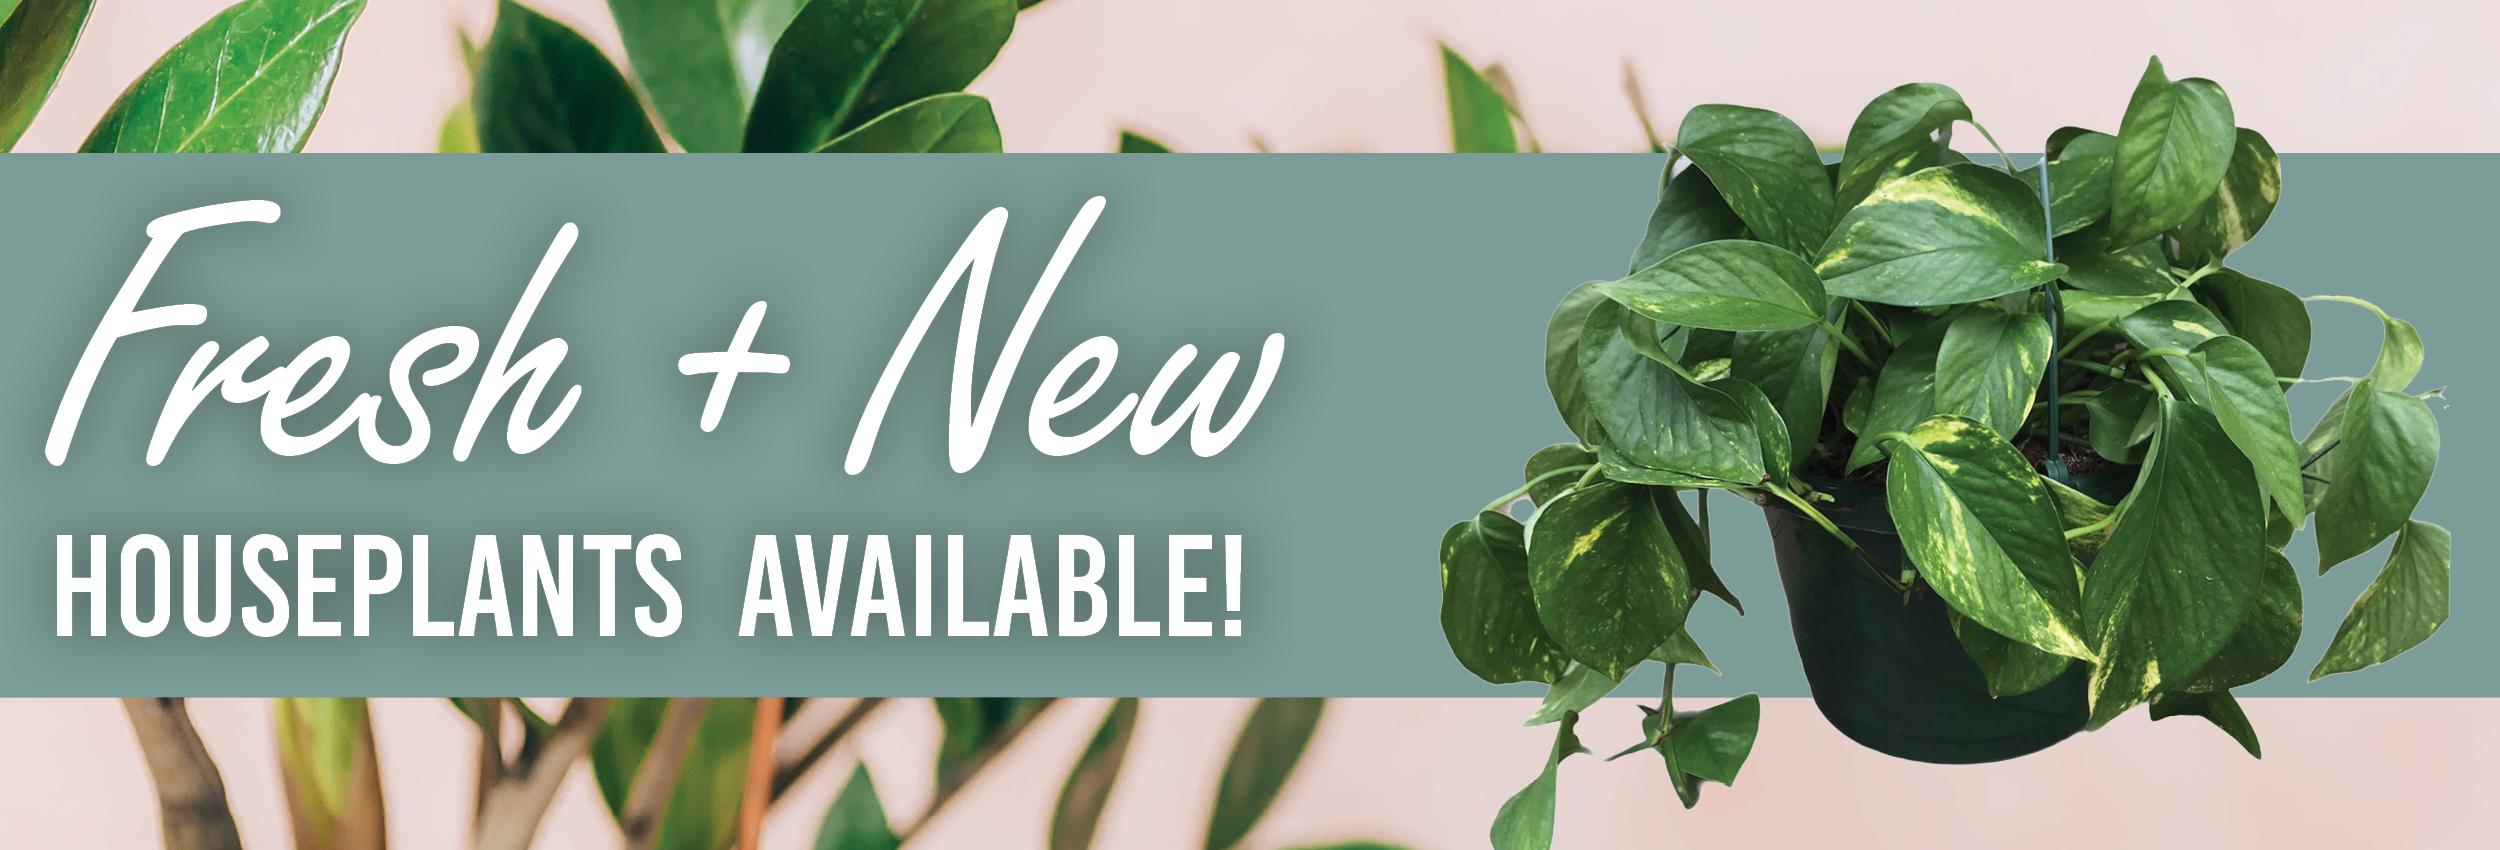 Fresh Houseplant Stock Availale